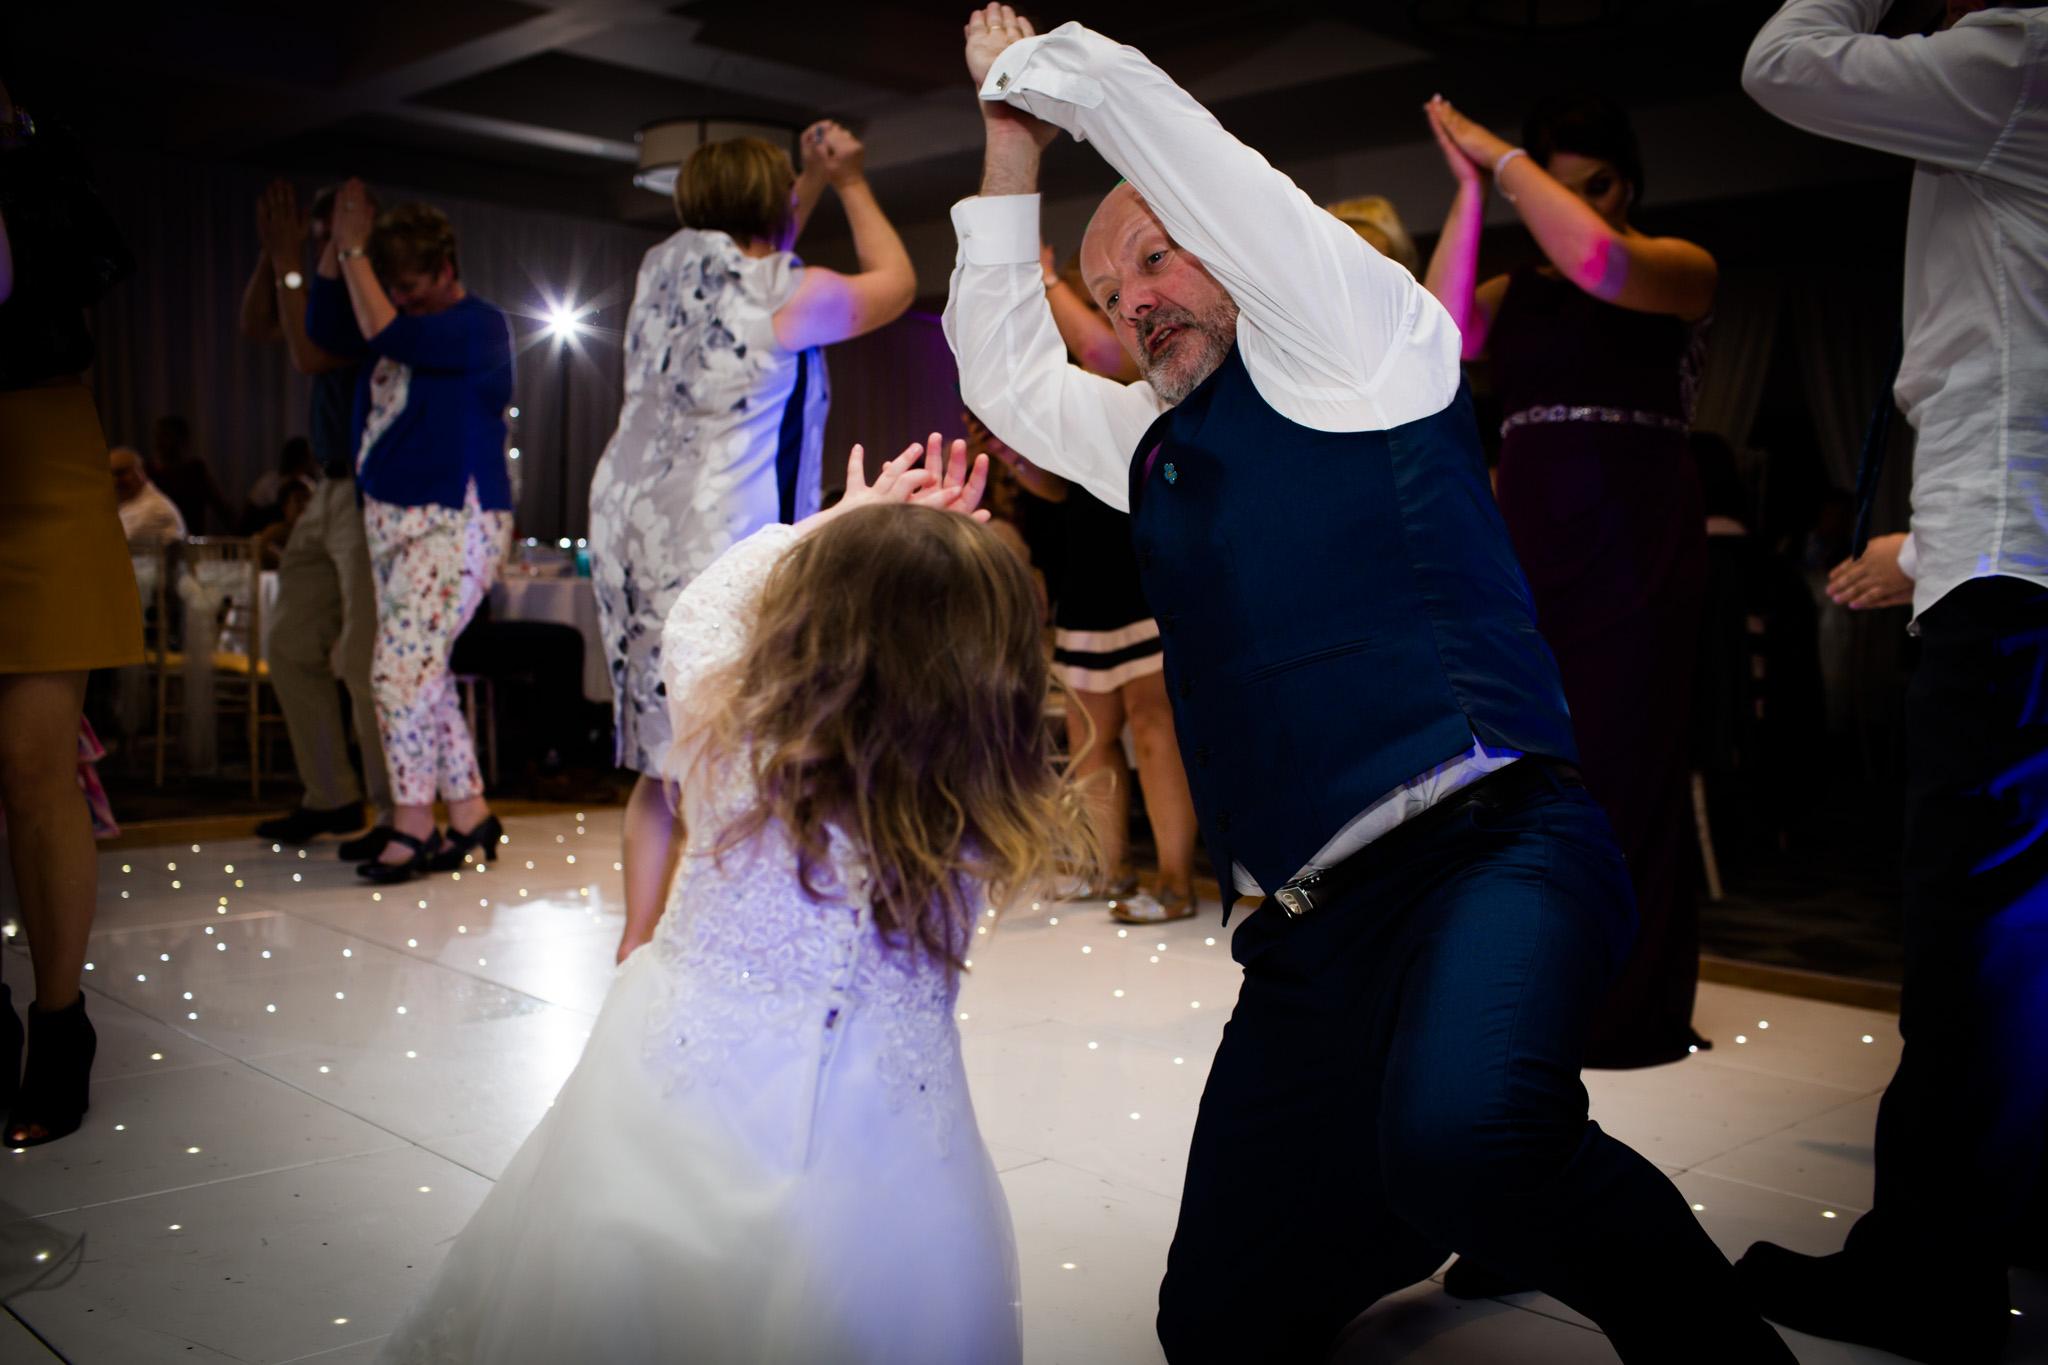 Mark_Barnes_Northern_Ireland_Wedding_Photography_Marine_hotel_ballycastle_Wedding_Photography_Janet&Darren-48.jpg